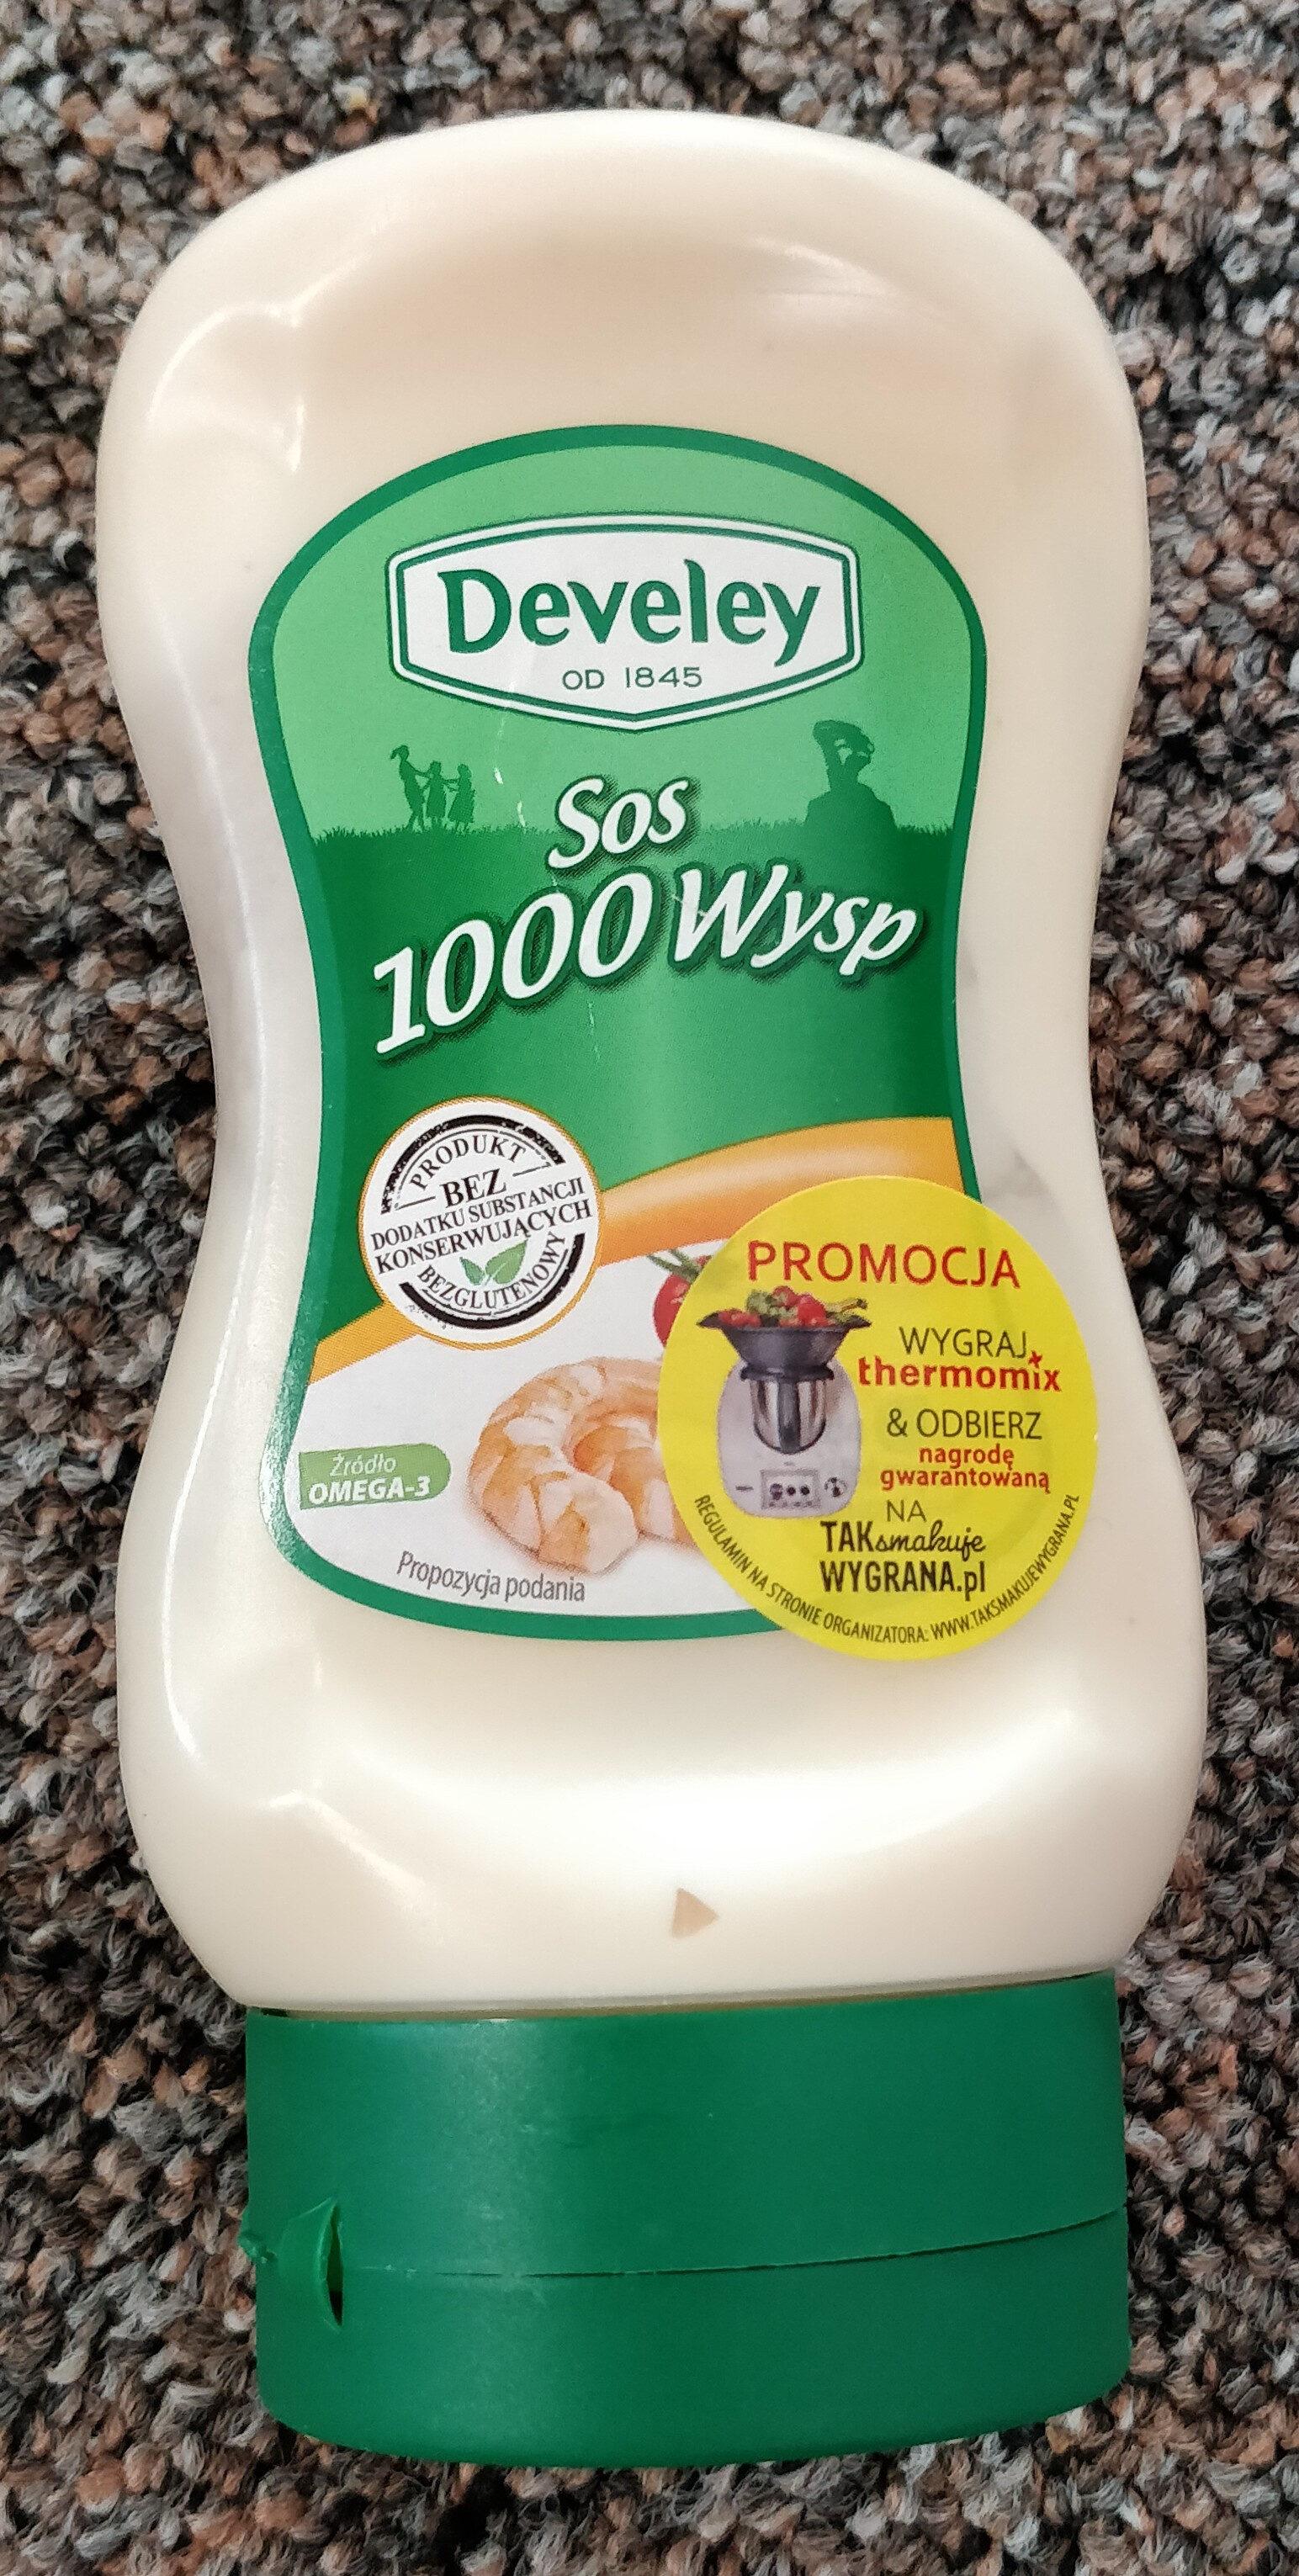 Sos 1000 Wysp - Produkt